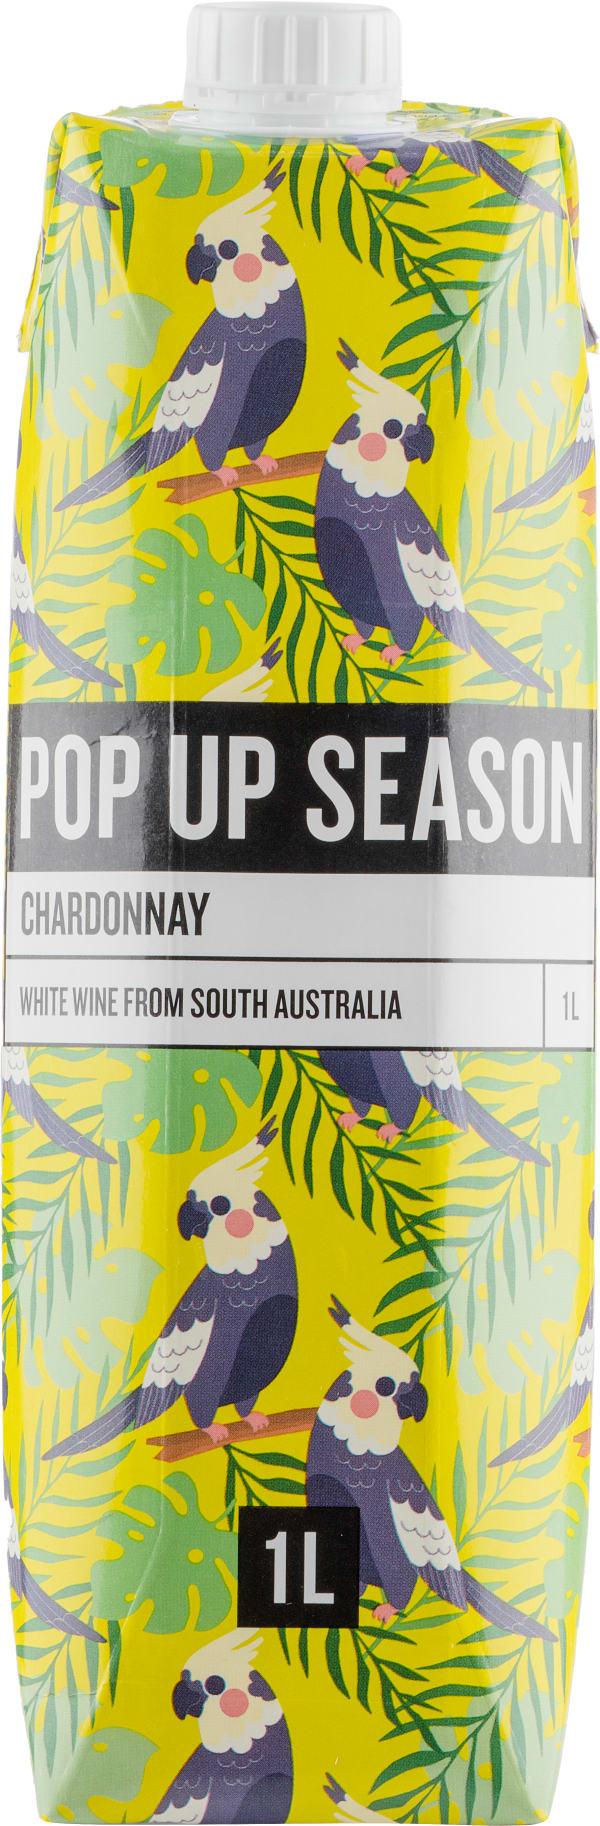 Pop Up Season Chardonnay 2017 carton package